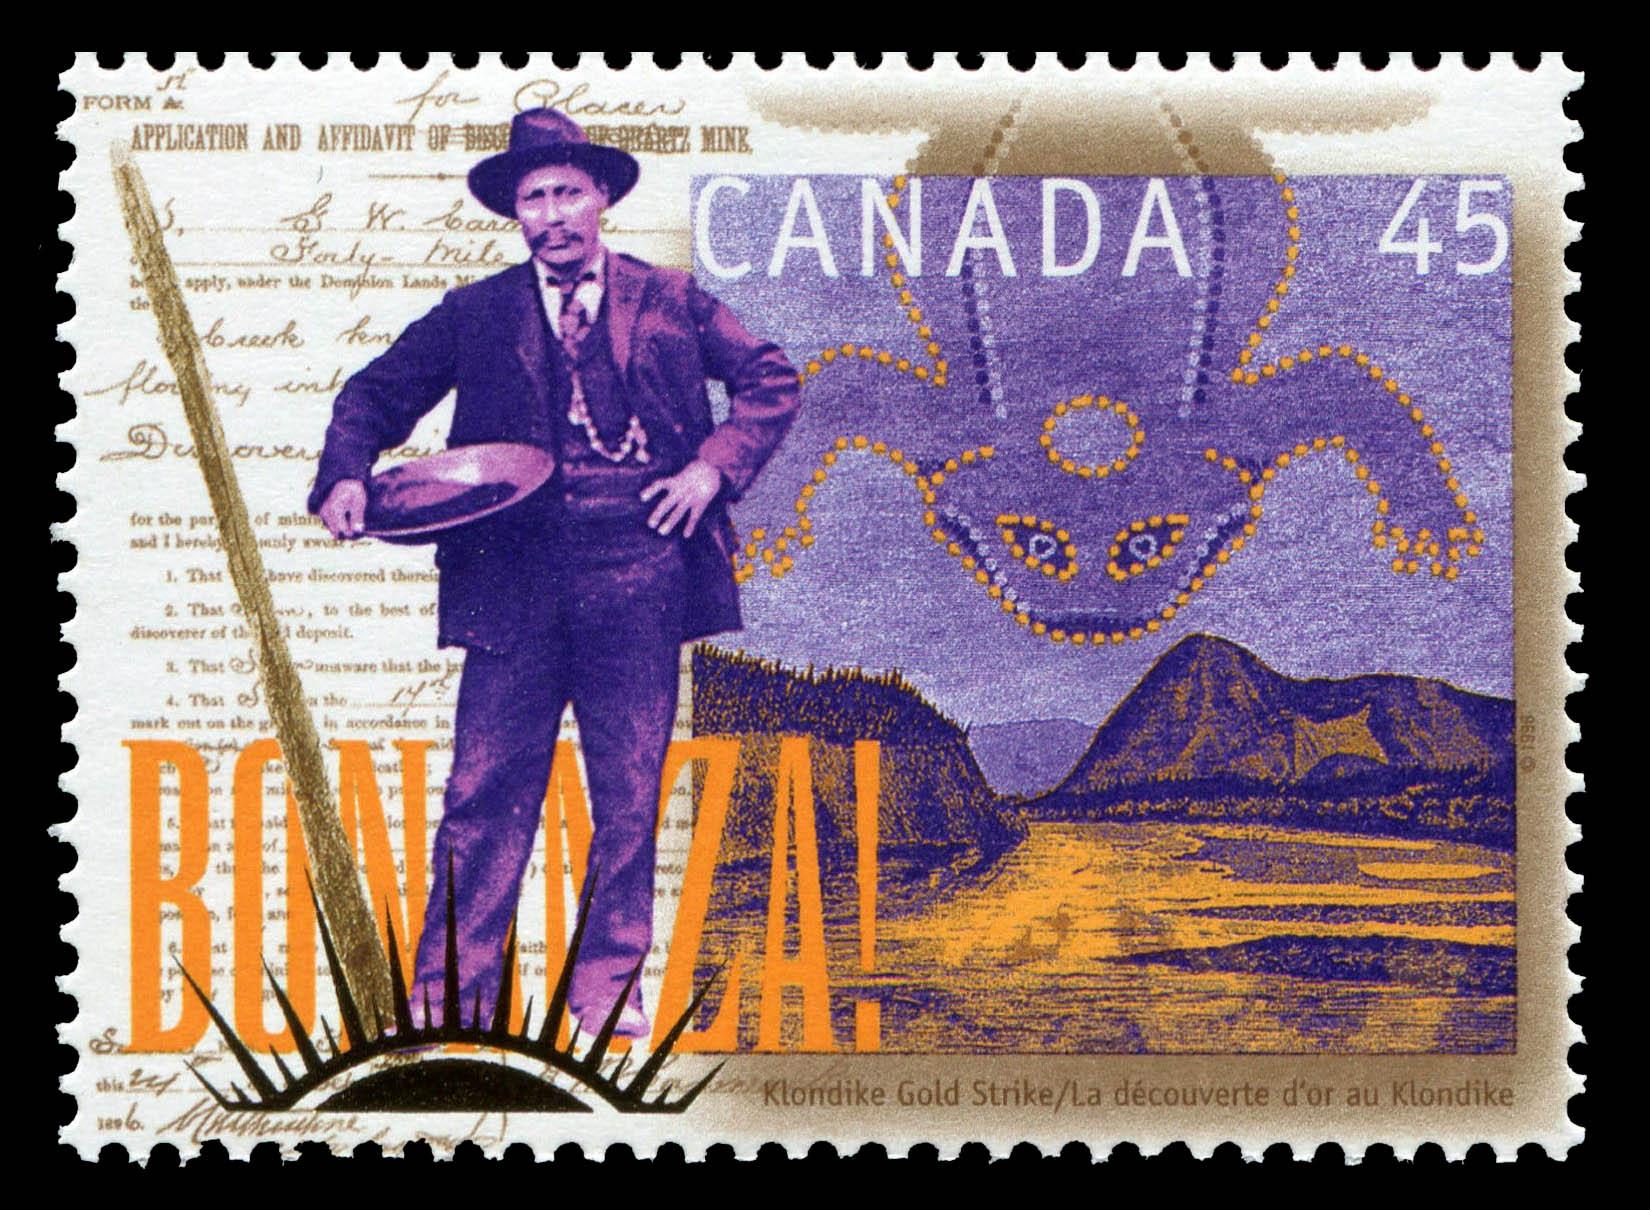 Klondike Gold Strike Canada Postage Stamp   Yukon Gold Discovery, 1896-1996